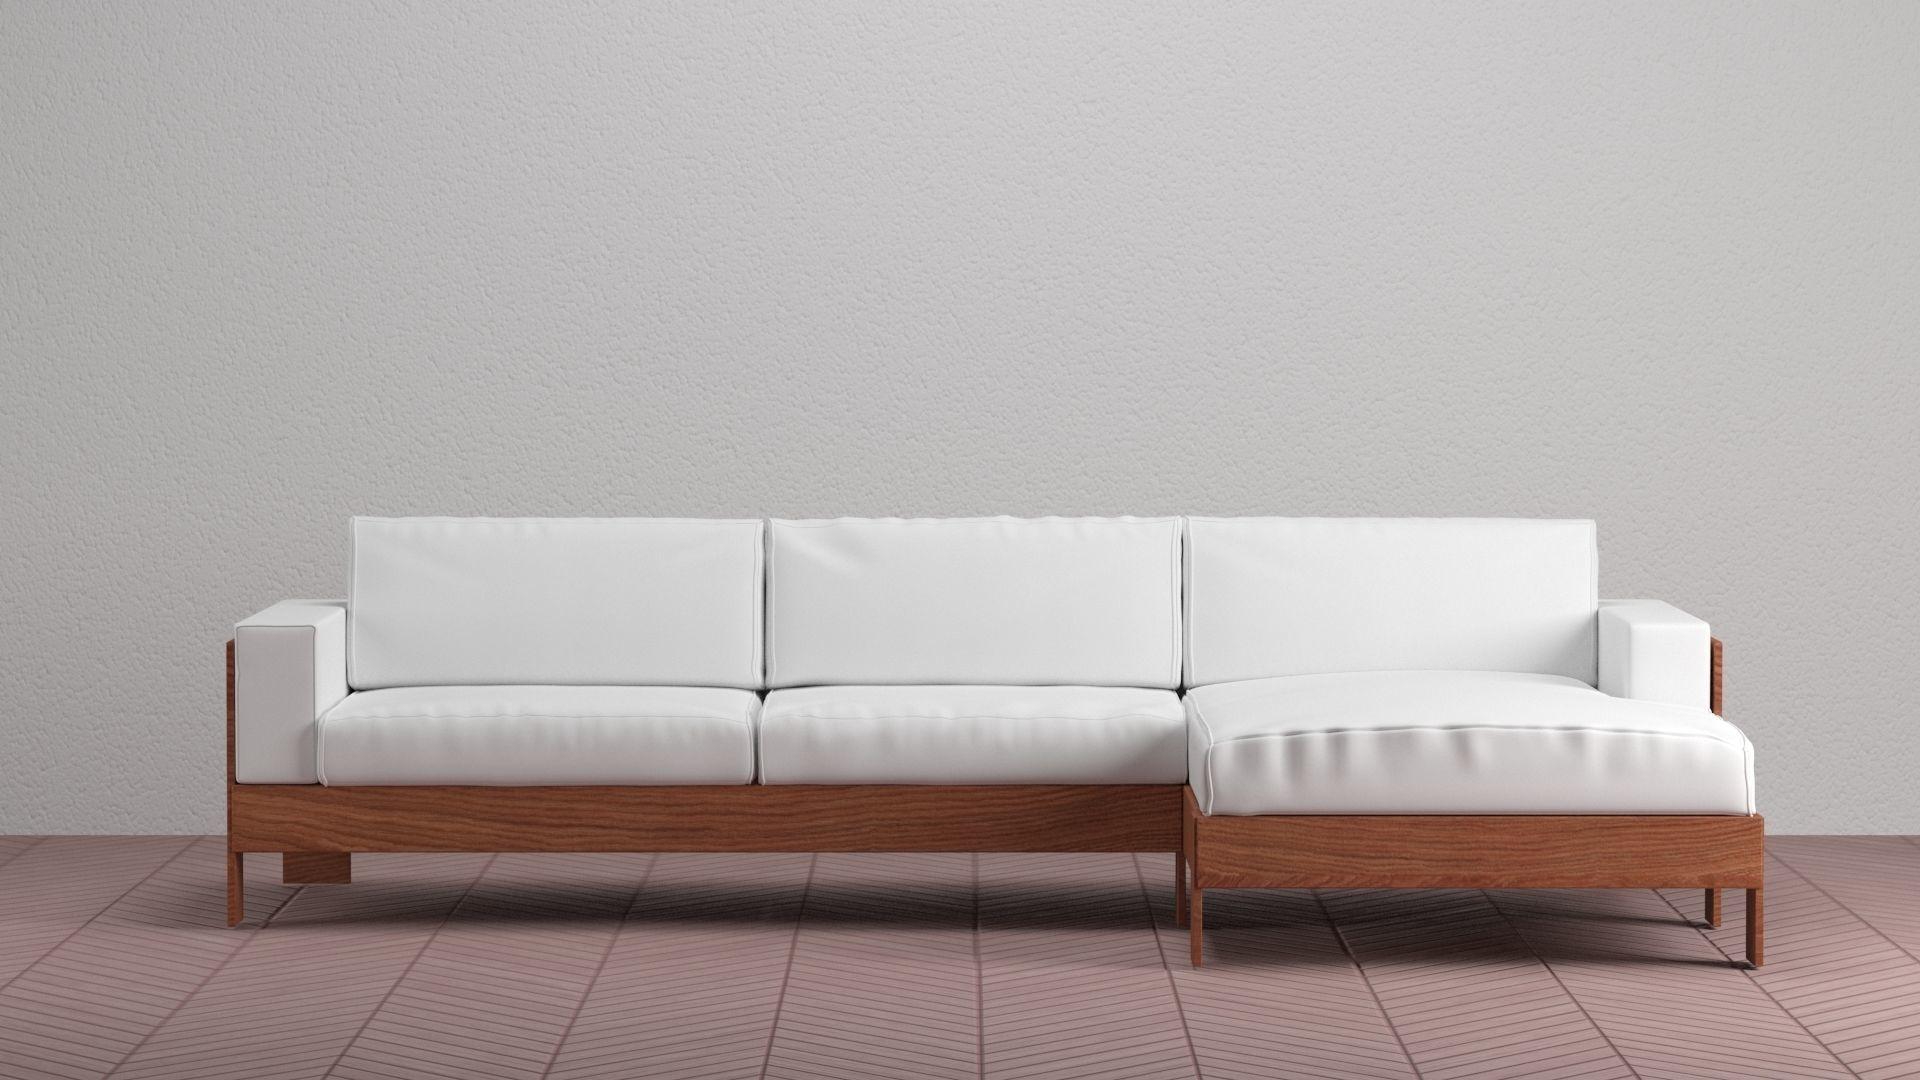 Wood Sofa With White Pillows V Ray And Corona Ready Render Model Max Obj